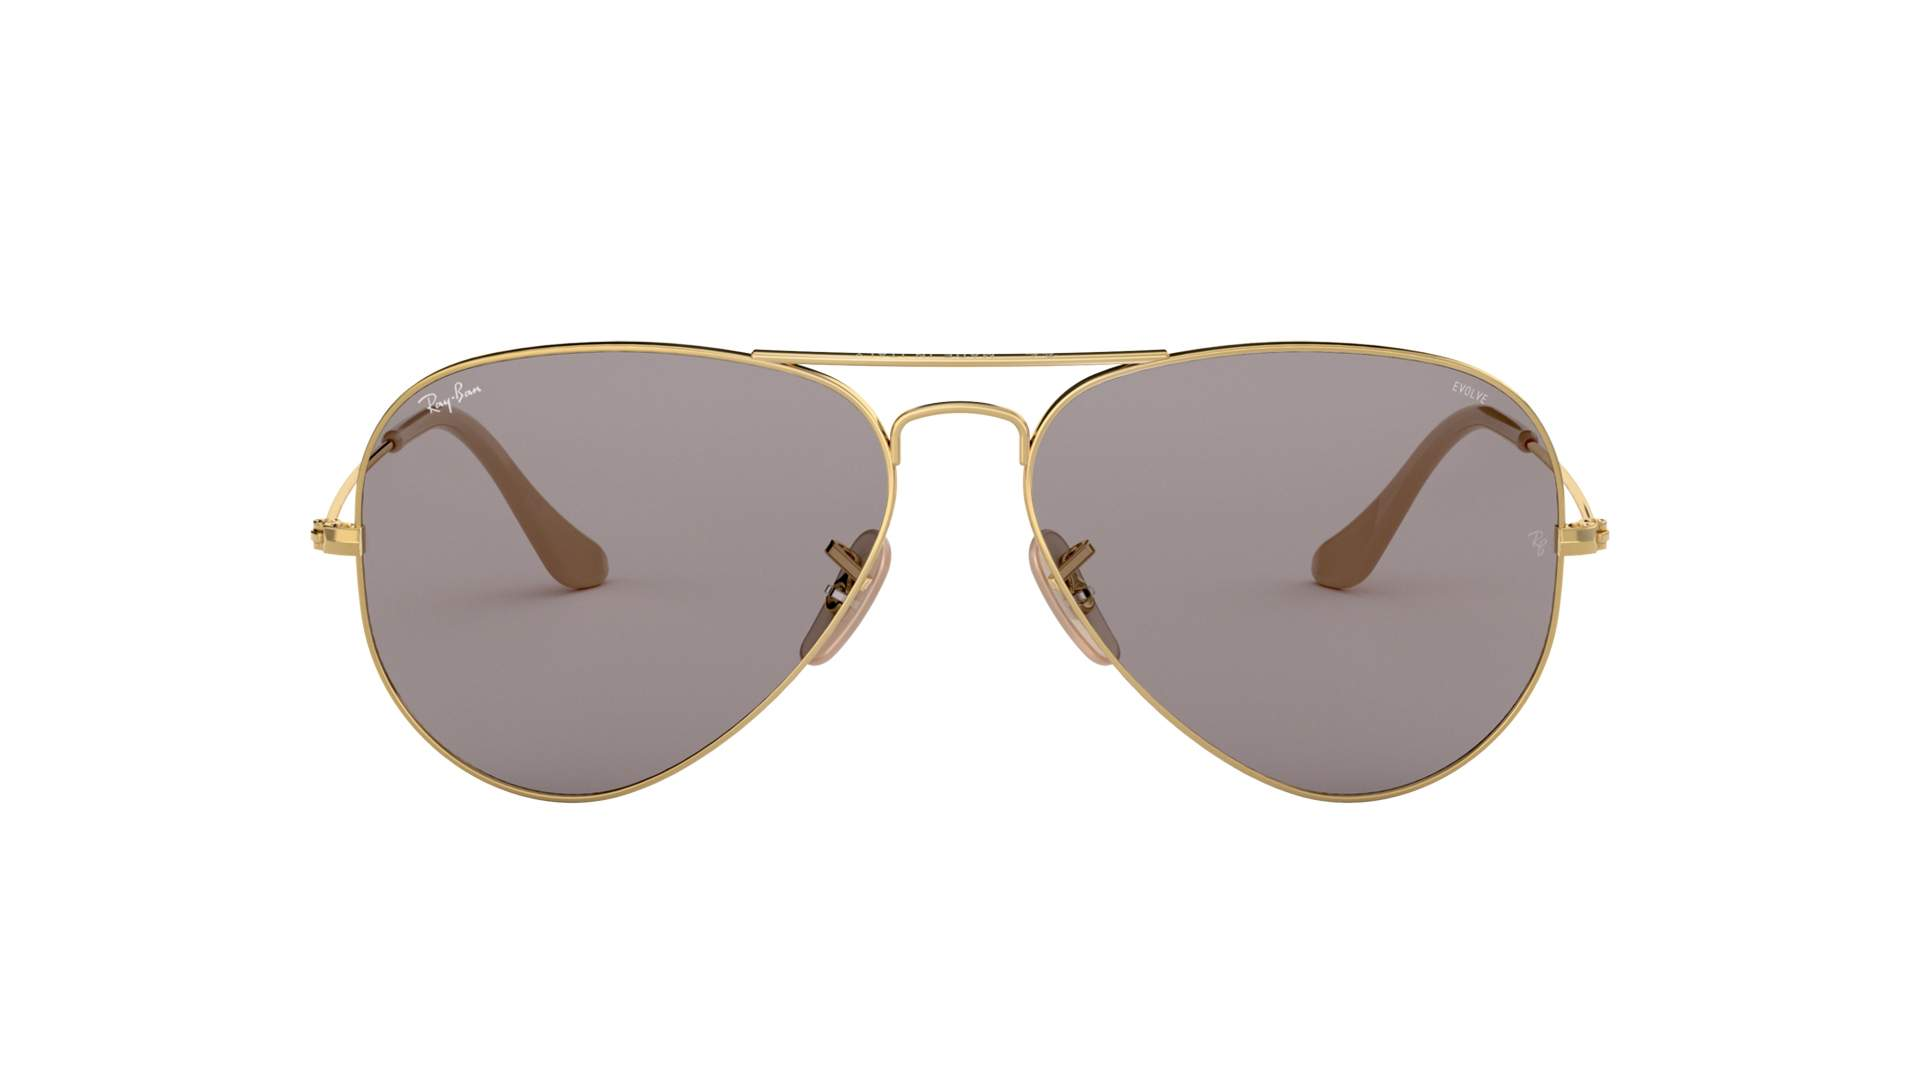 273b3873022d1 Sunglasses Ray-Ban Aviator Evolve Gold RB3025 9064 V8 58-14 Medium  Photochromic